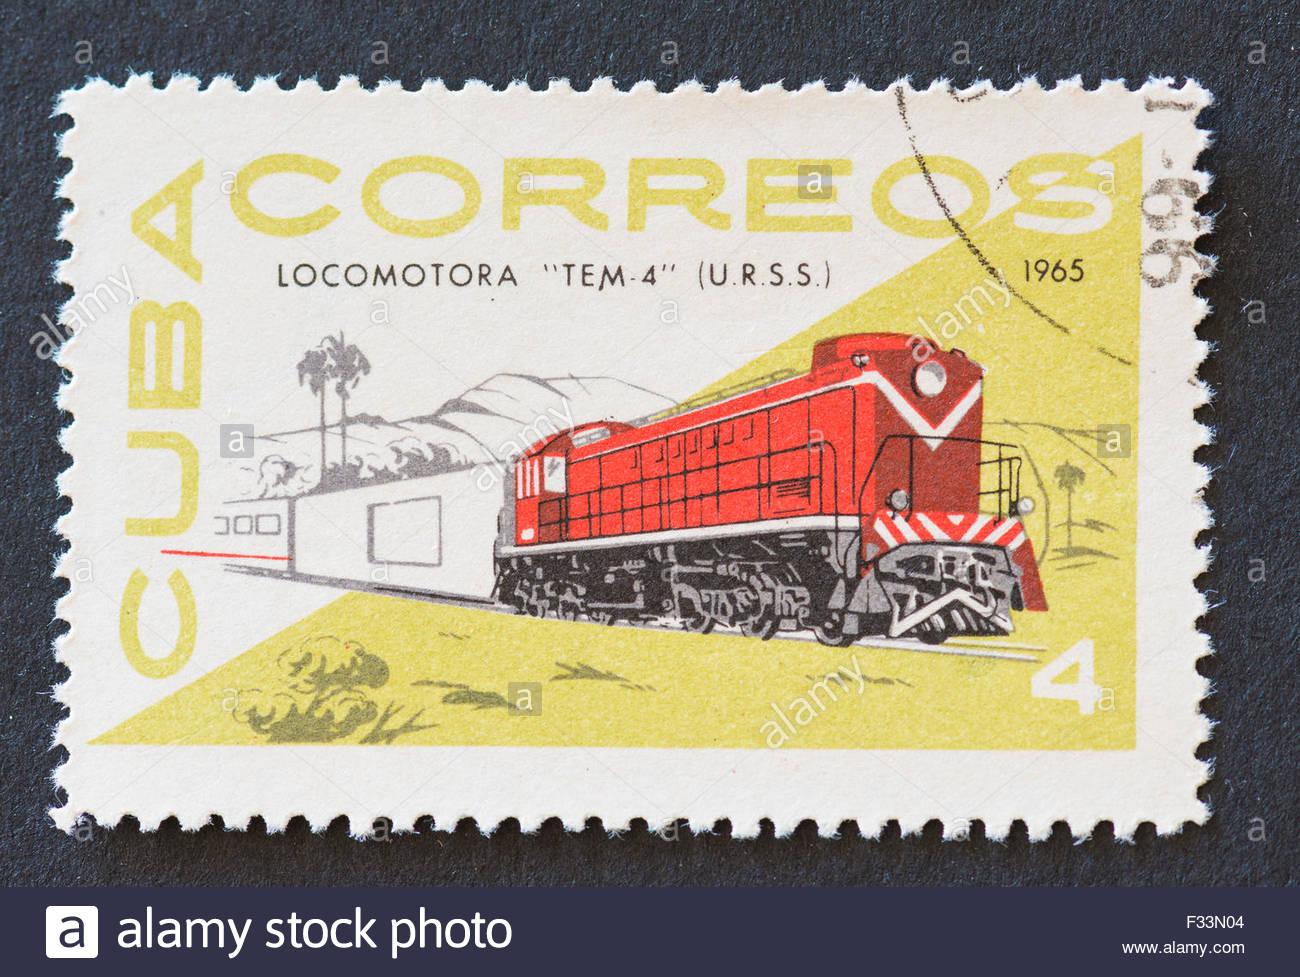 Cuban 1965 stamp from the 'Locomotora' series depicting the diesel locomotive 'TEM-4' of USSR. - Stock Image